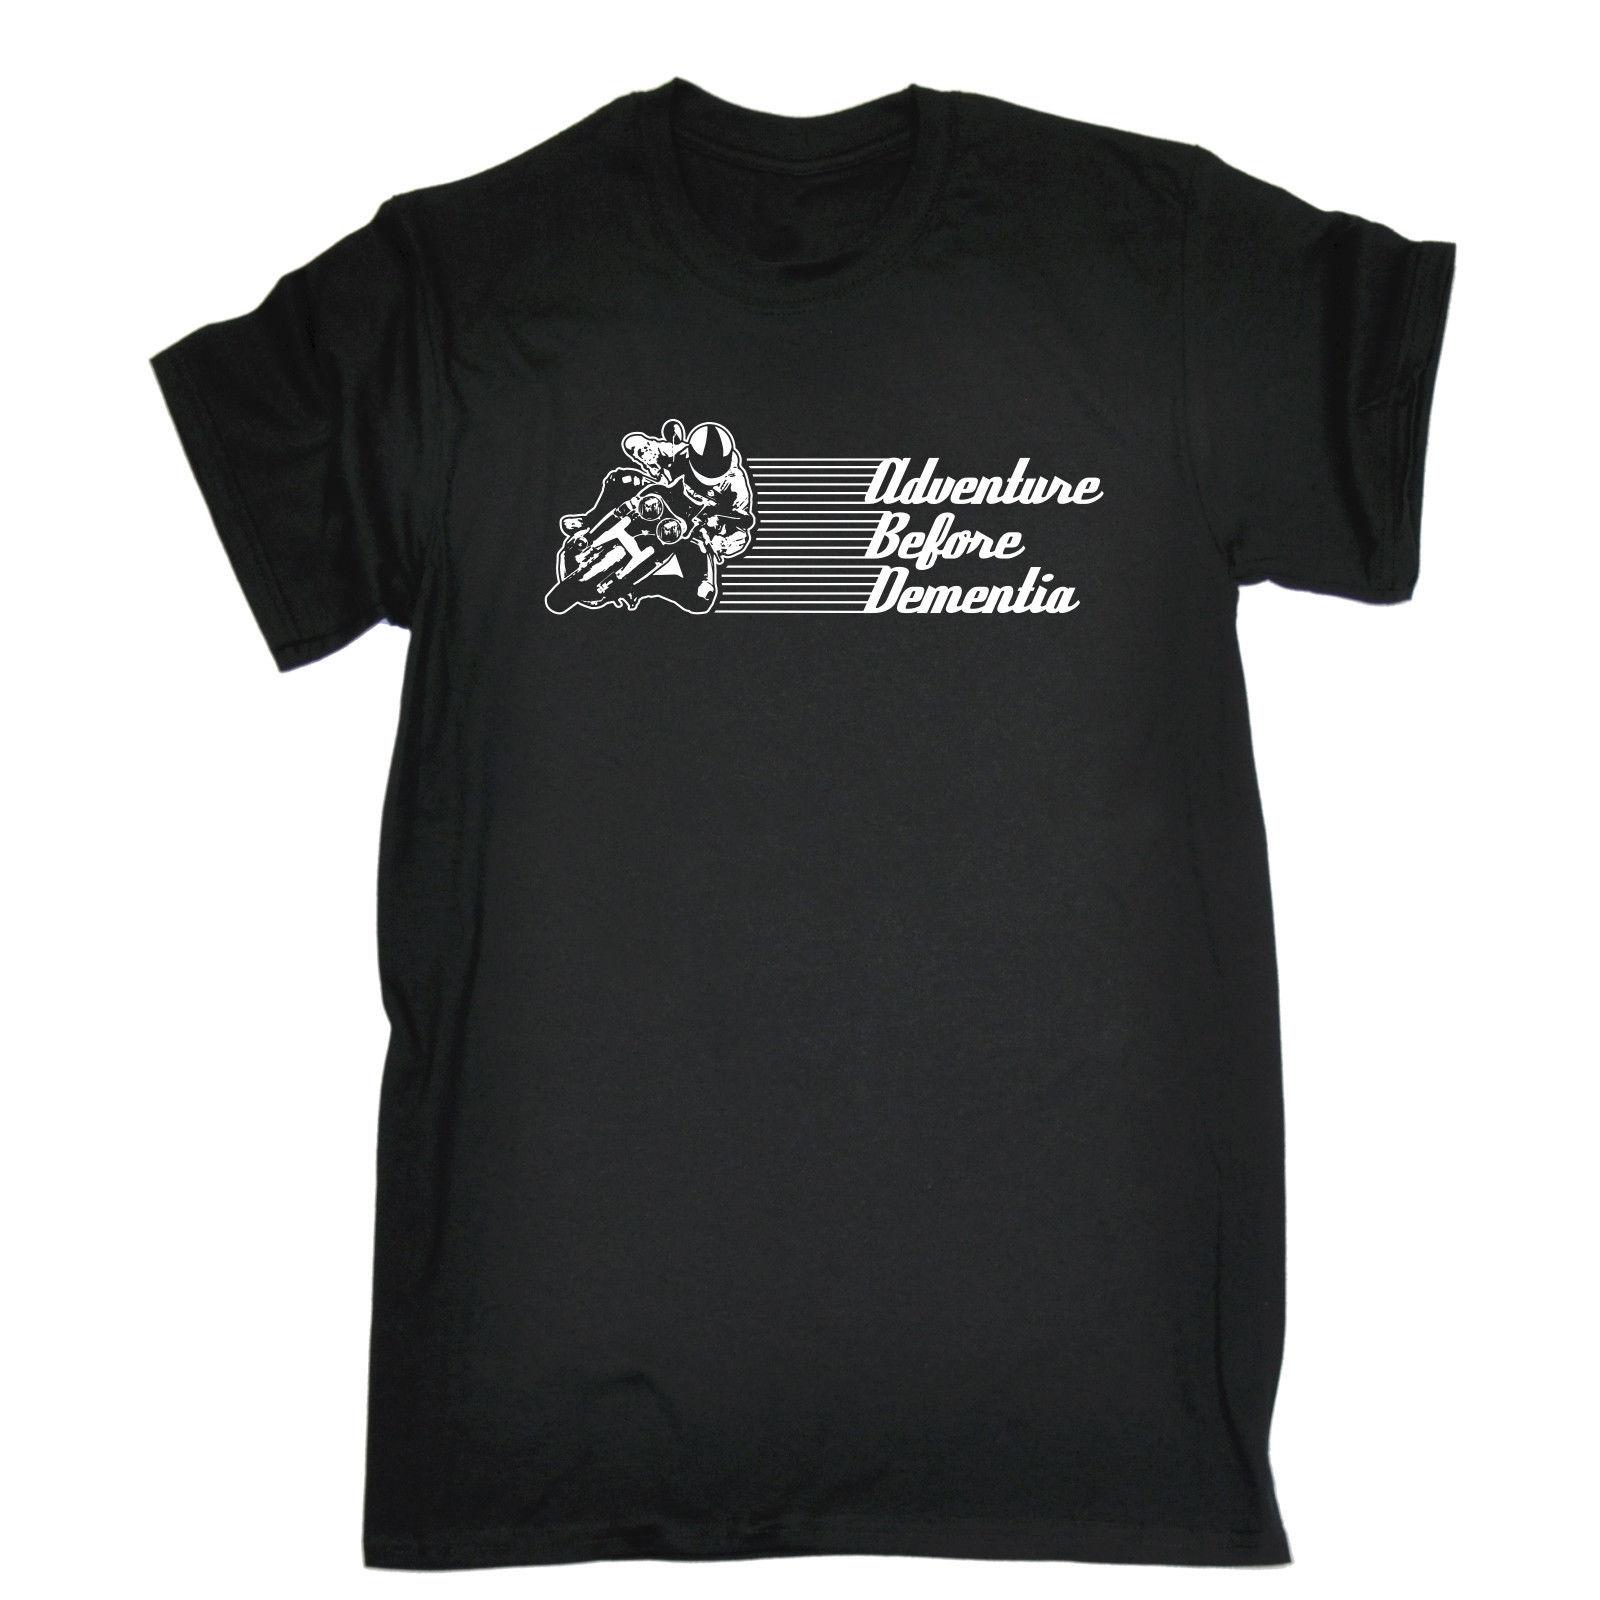 Adventure Before Dementia Motorbike T-SHIRT Fashion MotoX Funny Gift Birthday 100% Cotton Brand New T-Shirts